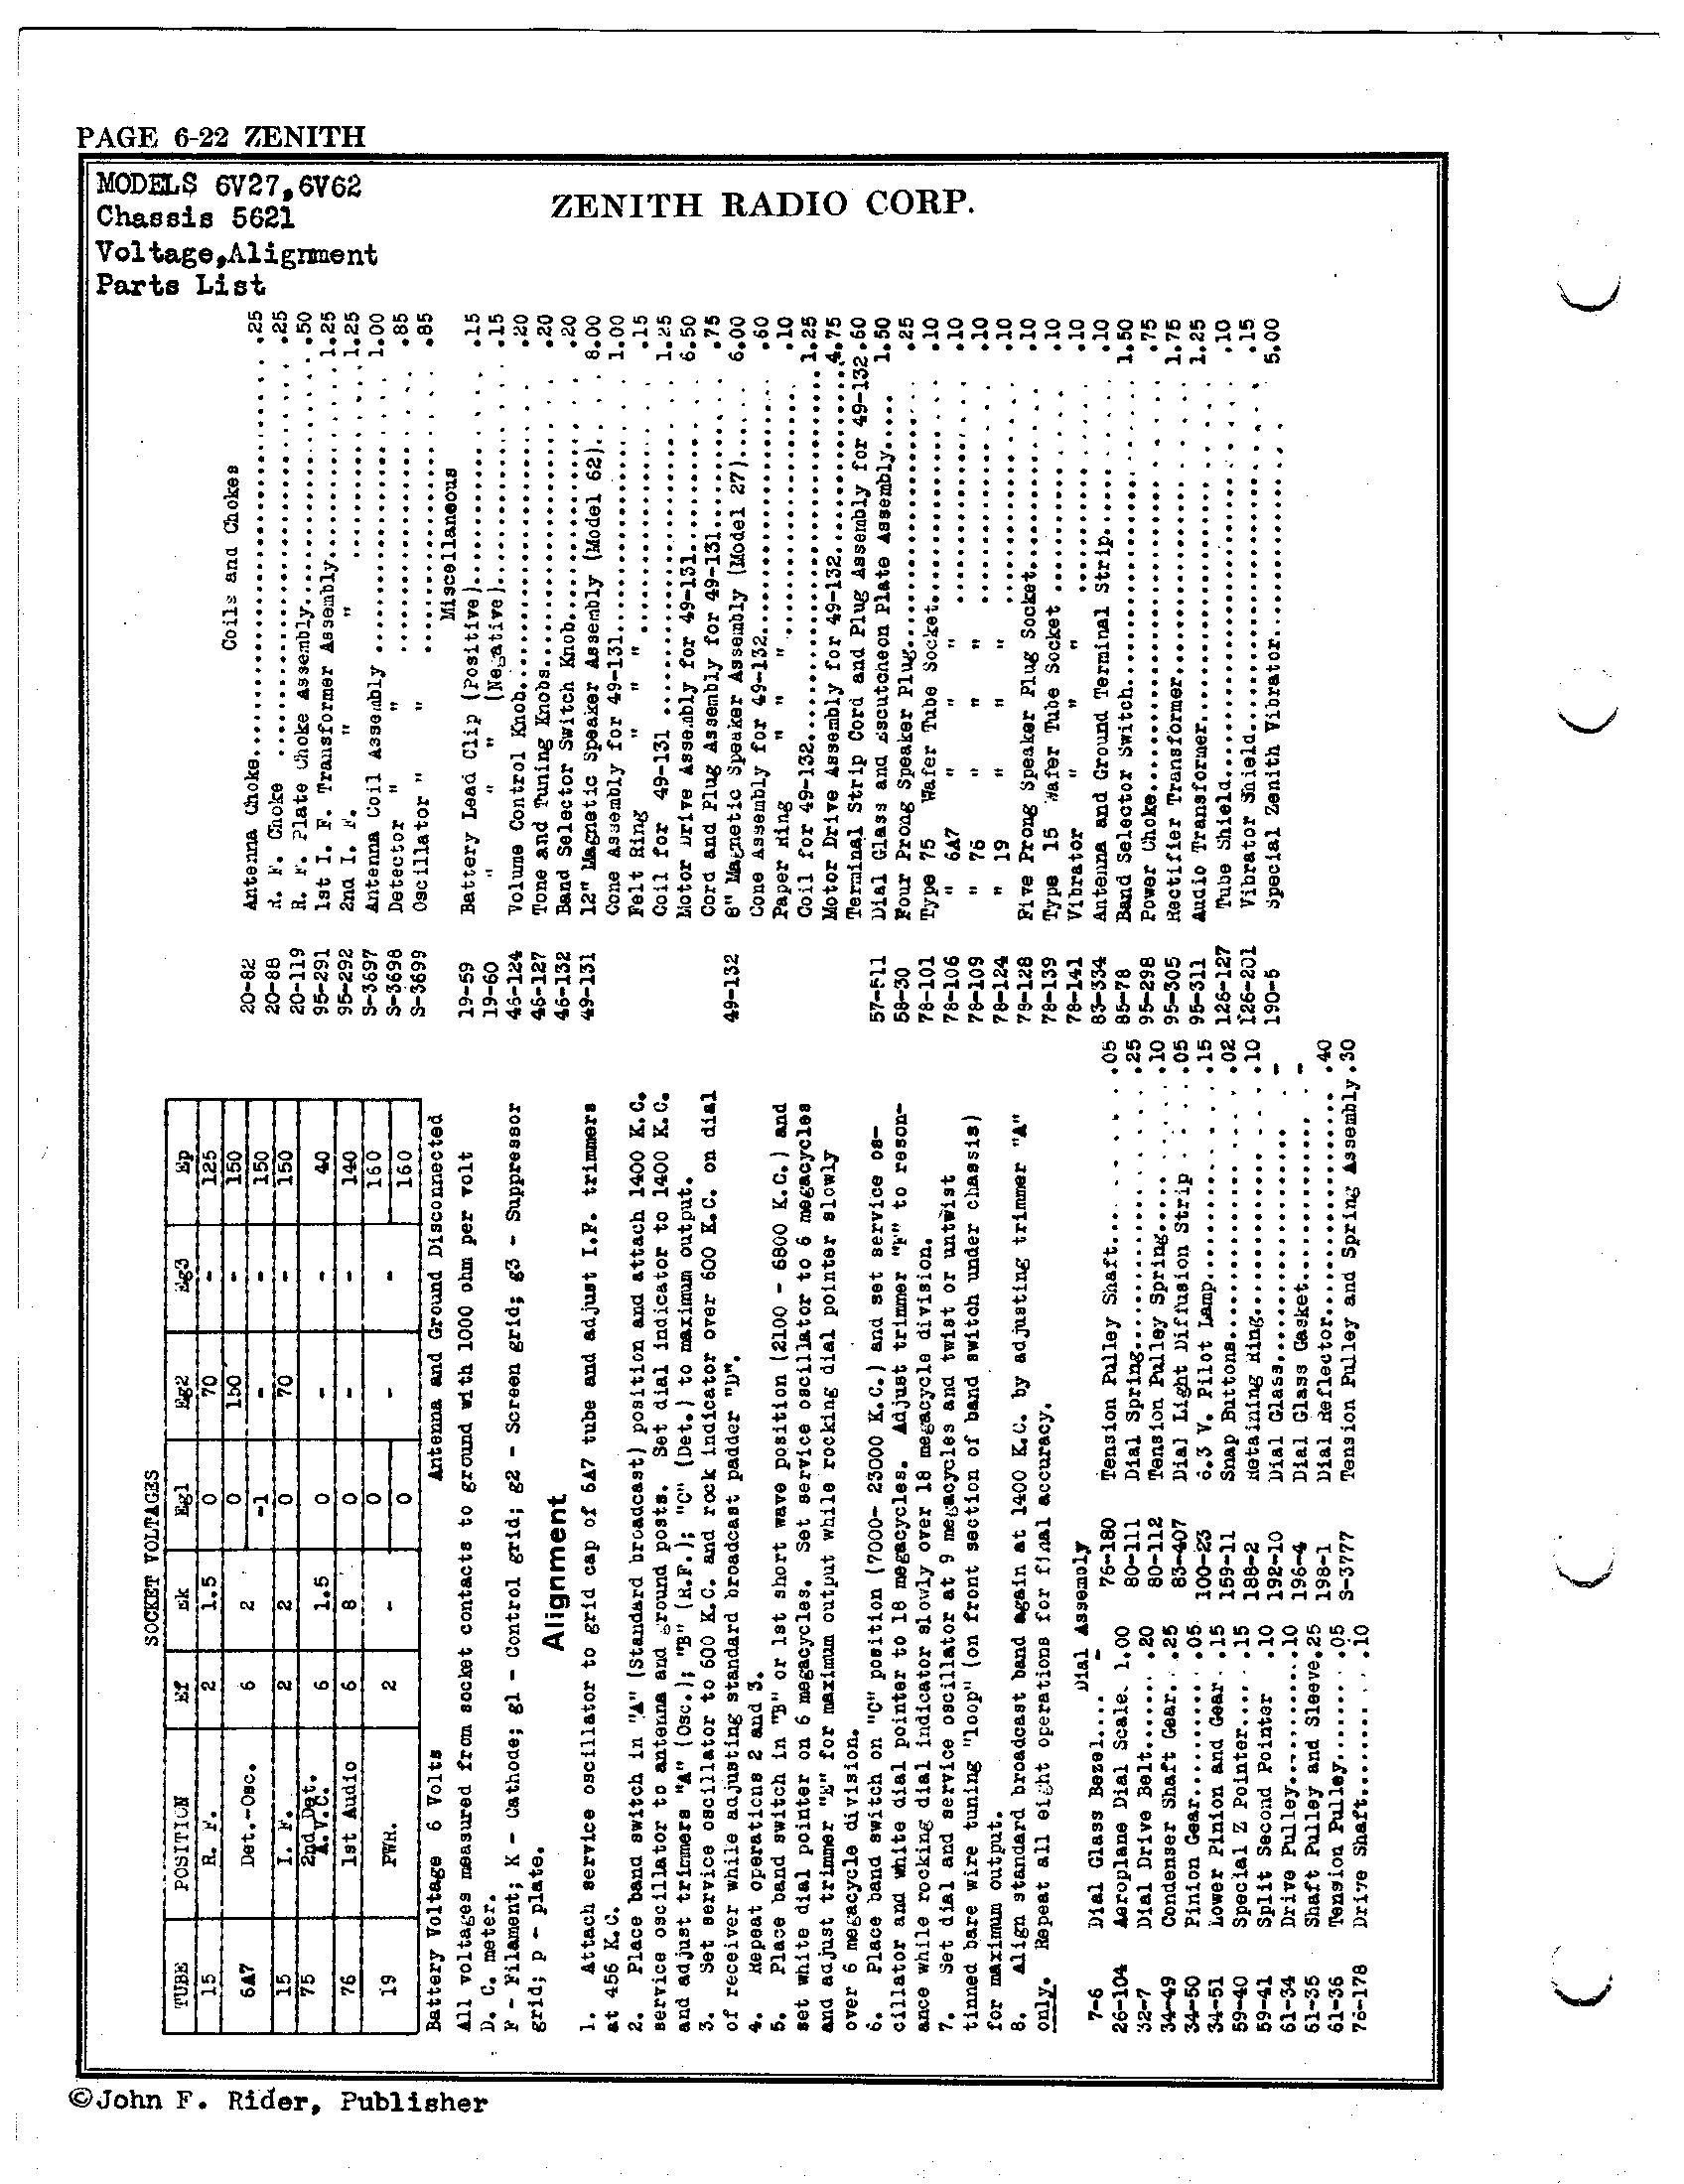 Zenith Radio Corp 6v27